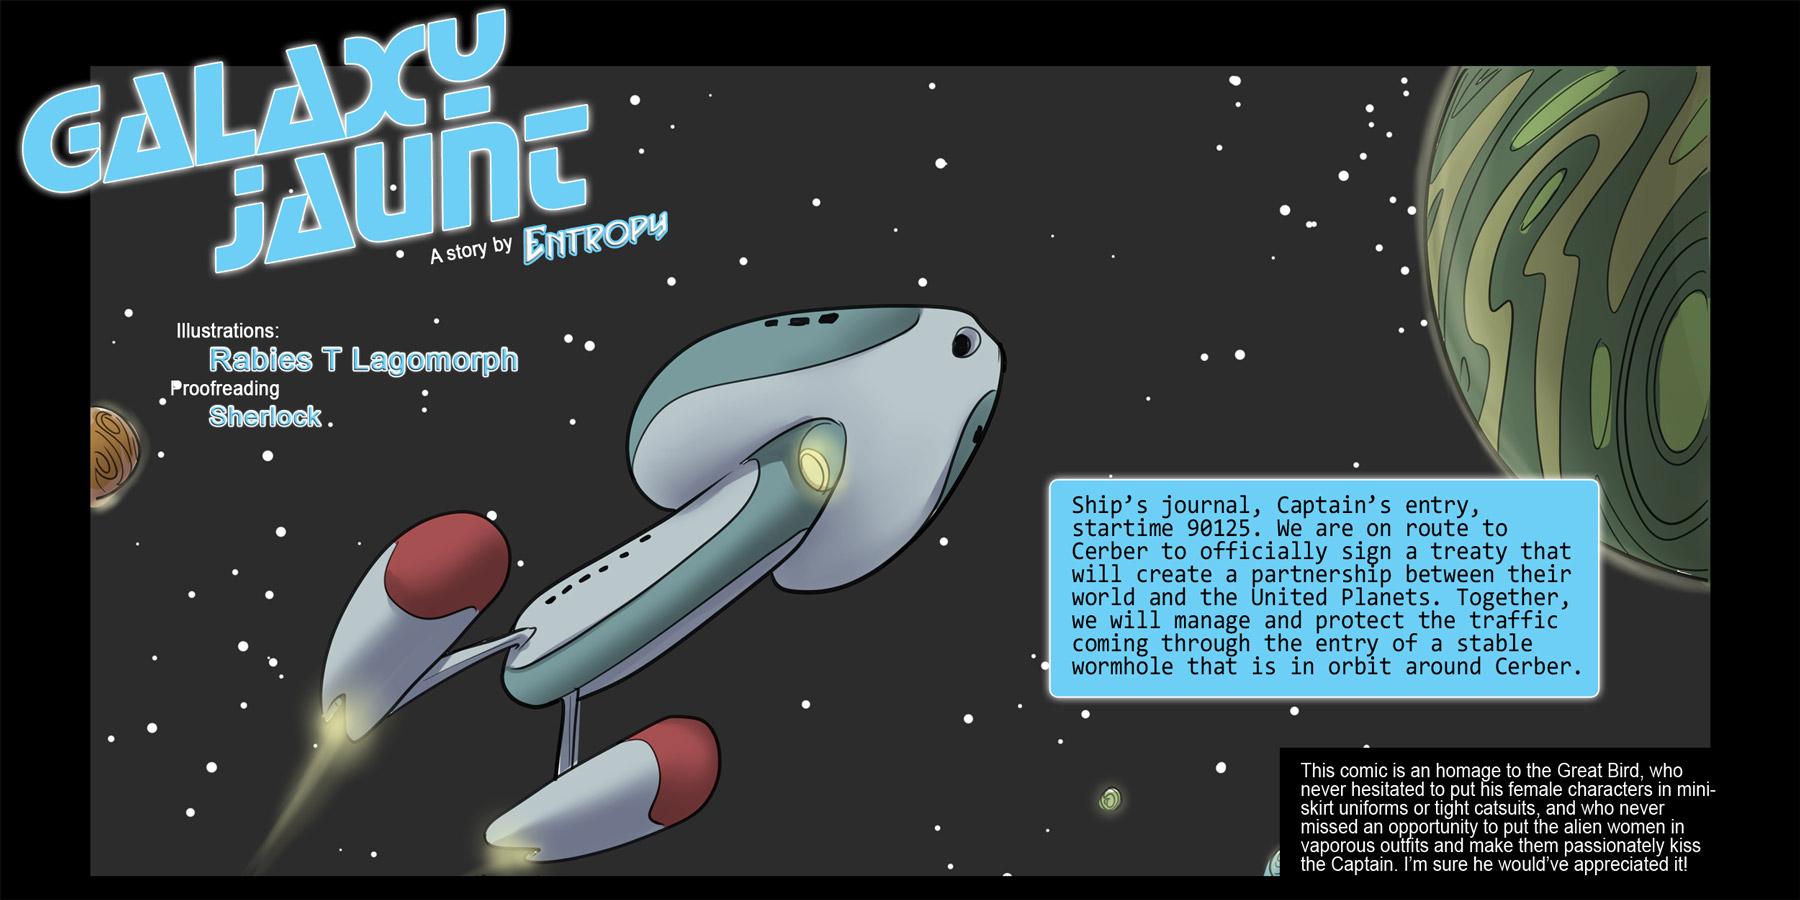 SureFap xxx porno Star Trek - [Rabies T Lagomorph (Entropy)] - Galaxy Jaunt - Episode 1